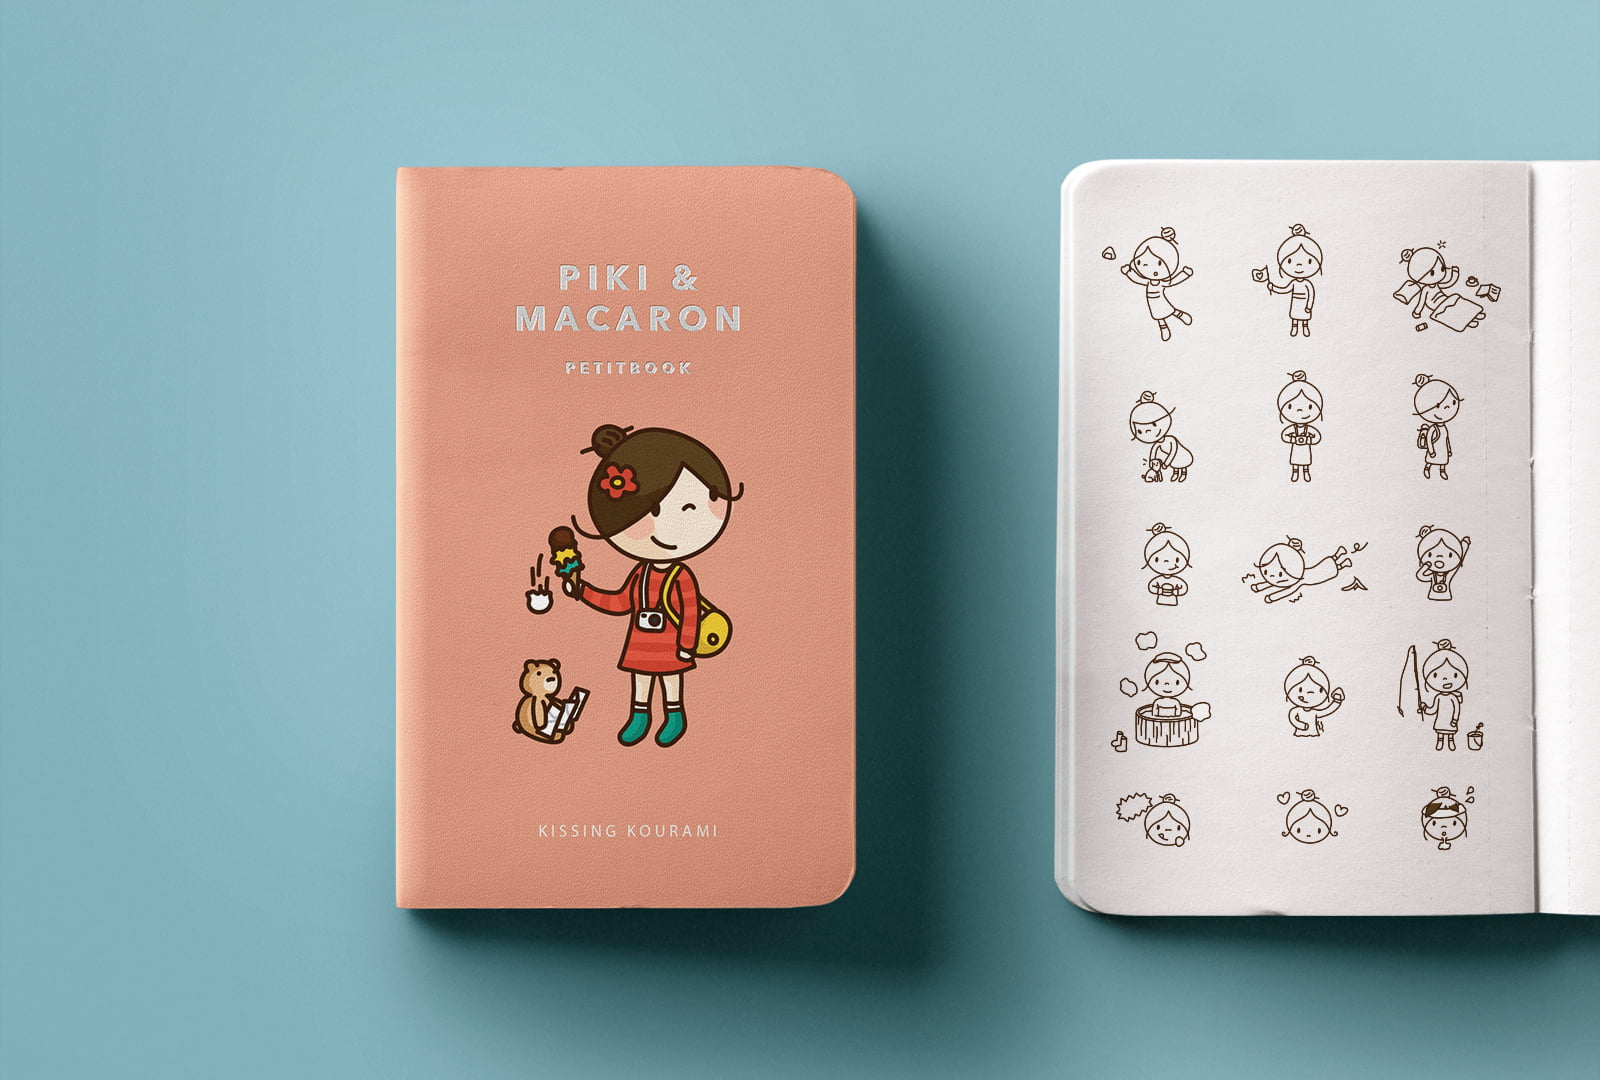 kourami-piki-macaron-notebook-2